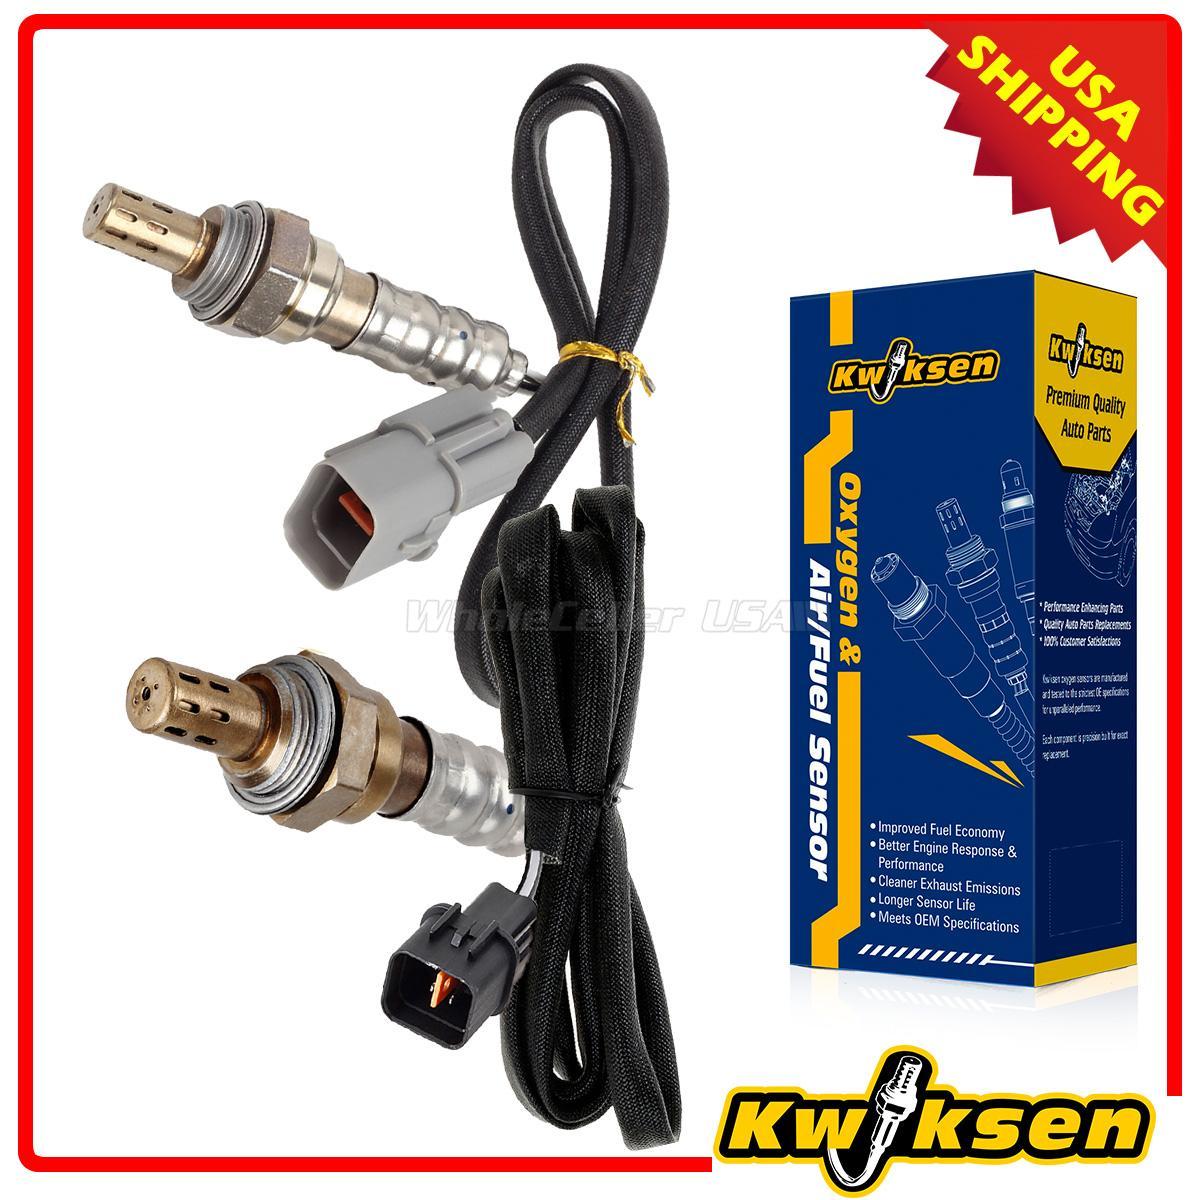 2x O2 Oxygen Sensors for Mitsubishi Eclipse 06-12 Cyl 3 4 Galant 2.4L Upstream